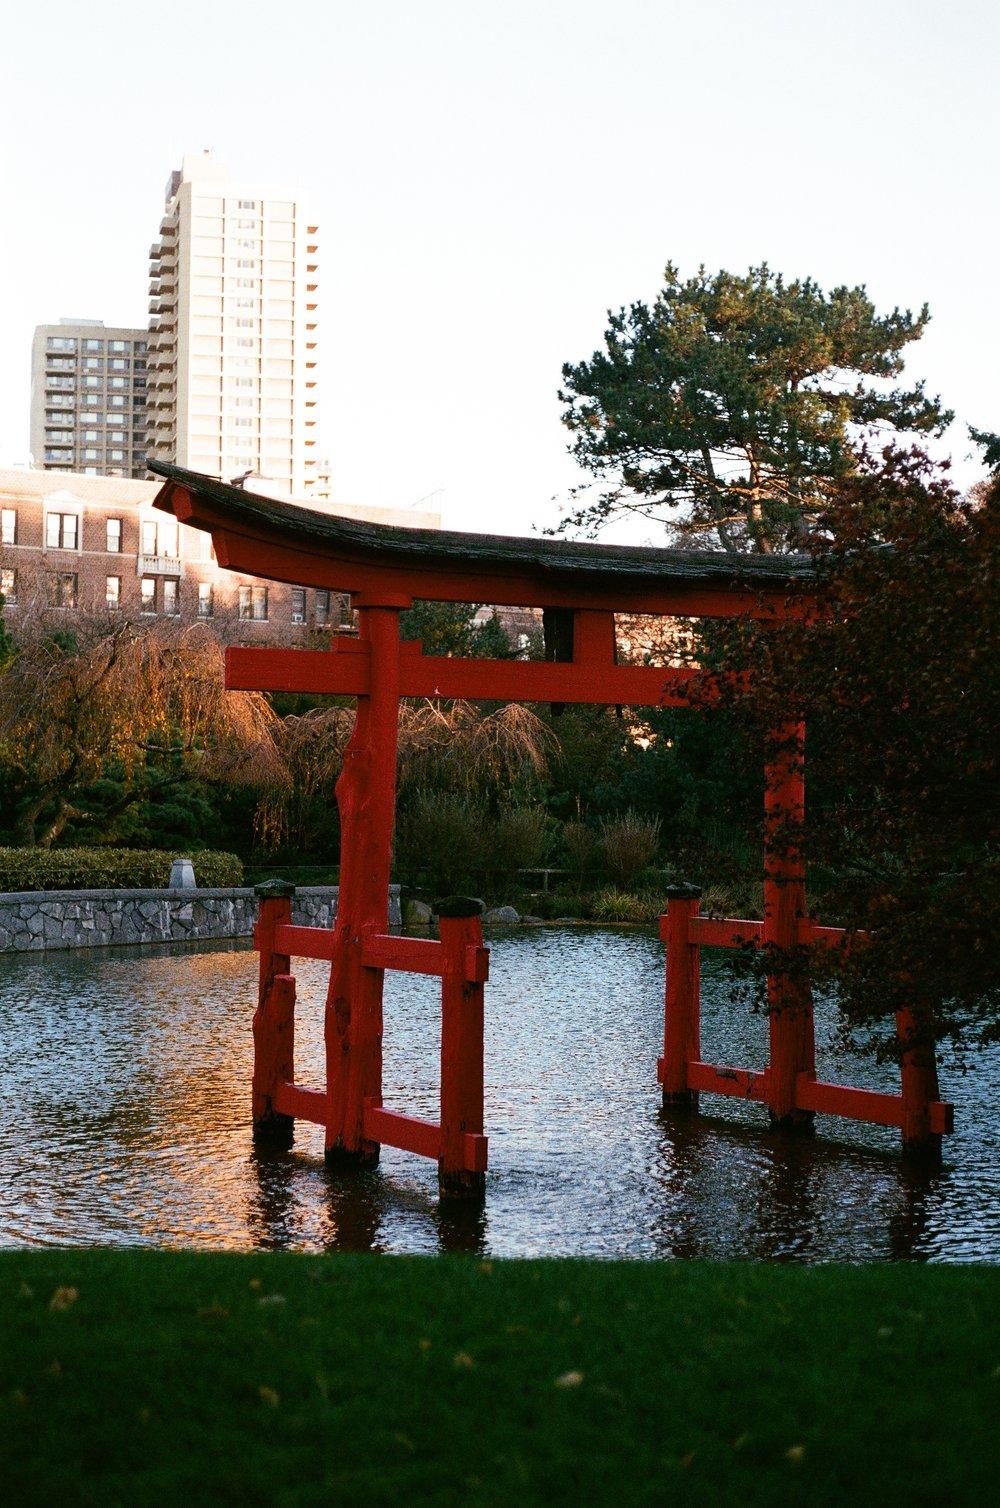 Inari Shrine,Japanese Hill-and-Pond Garden, November 2017